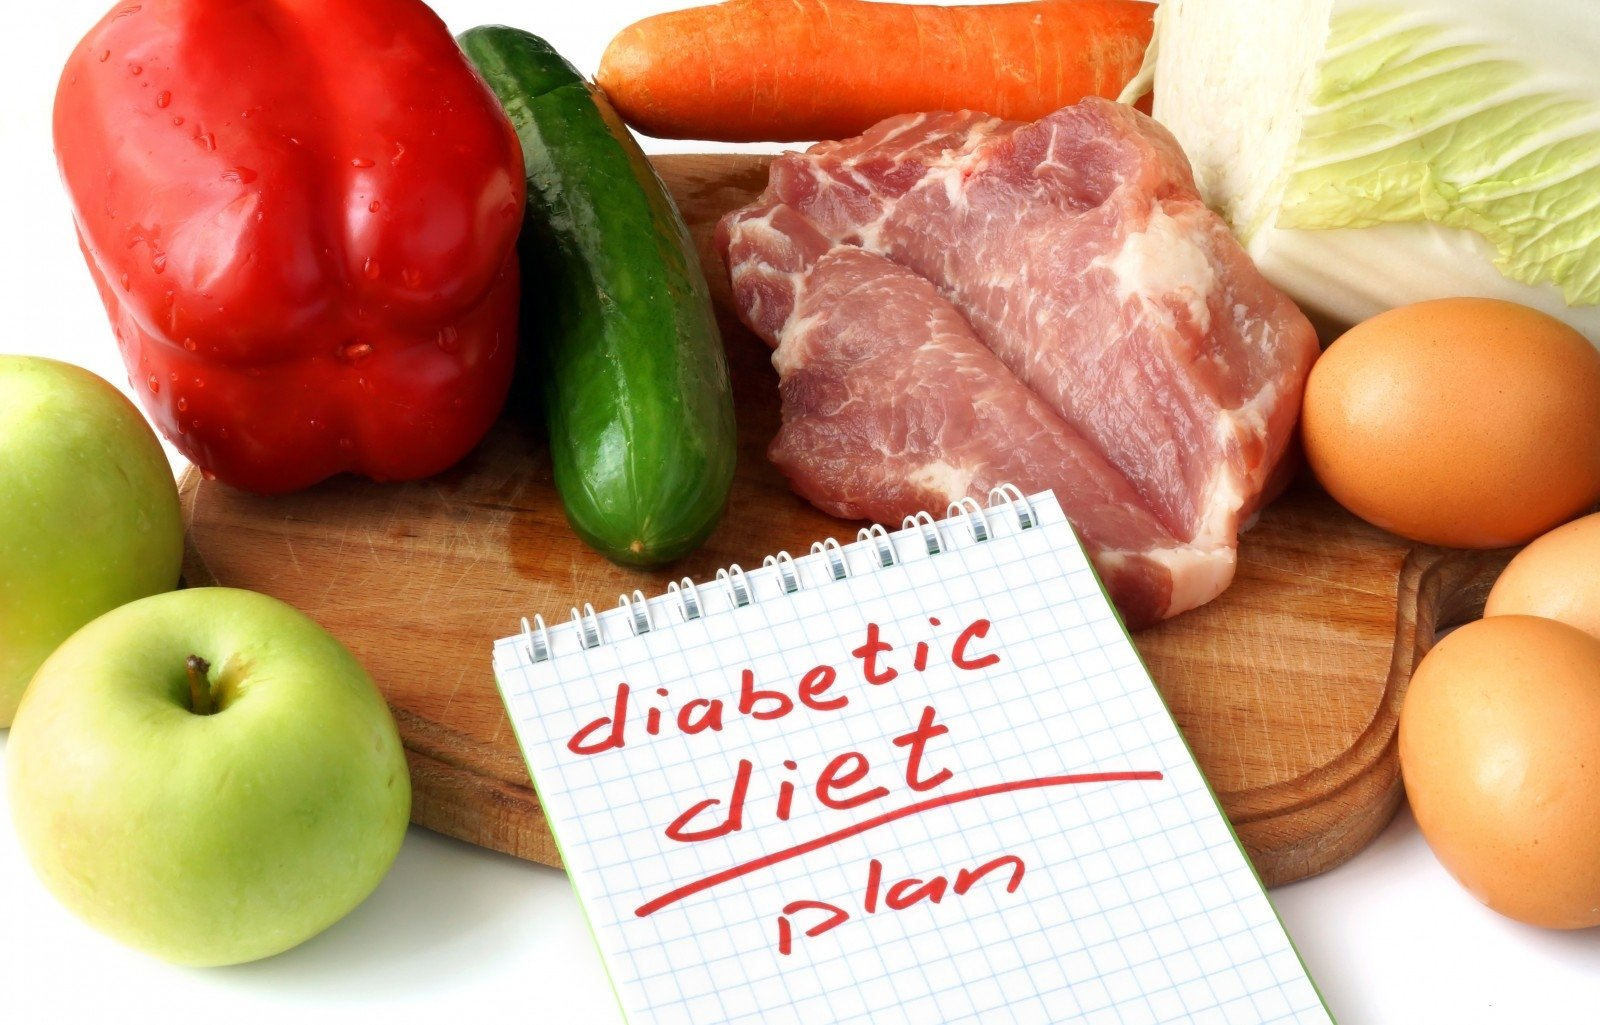 geriausia dieta sergant hipertenzija